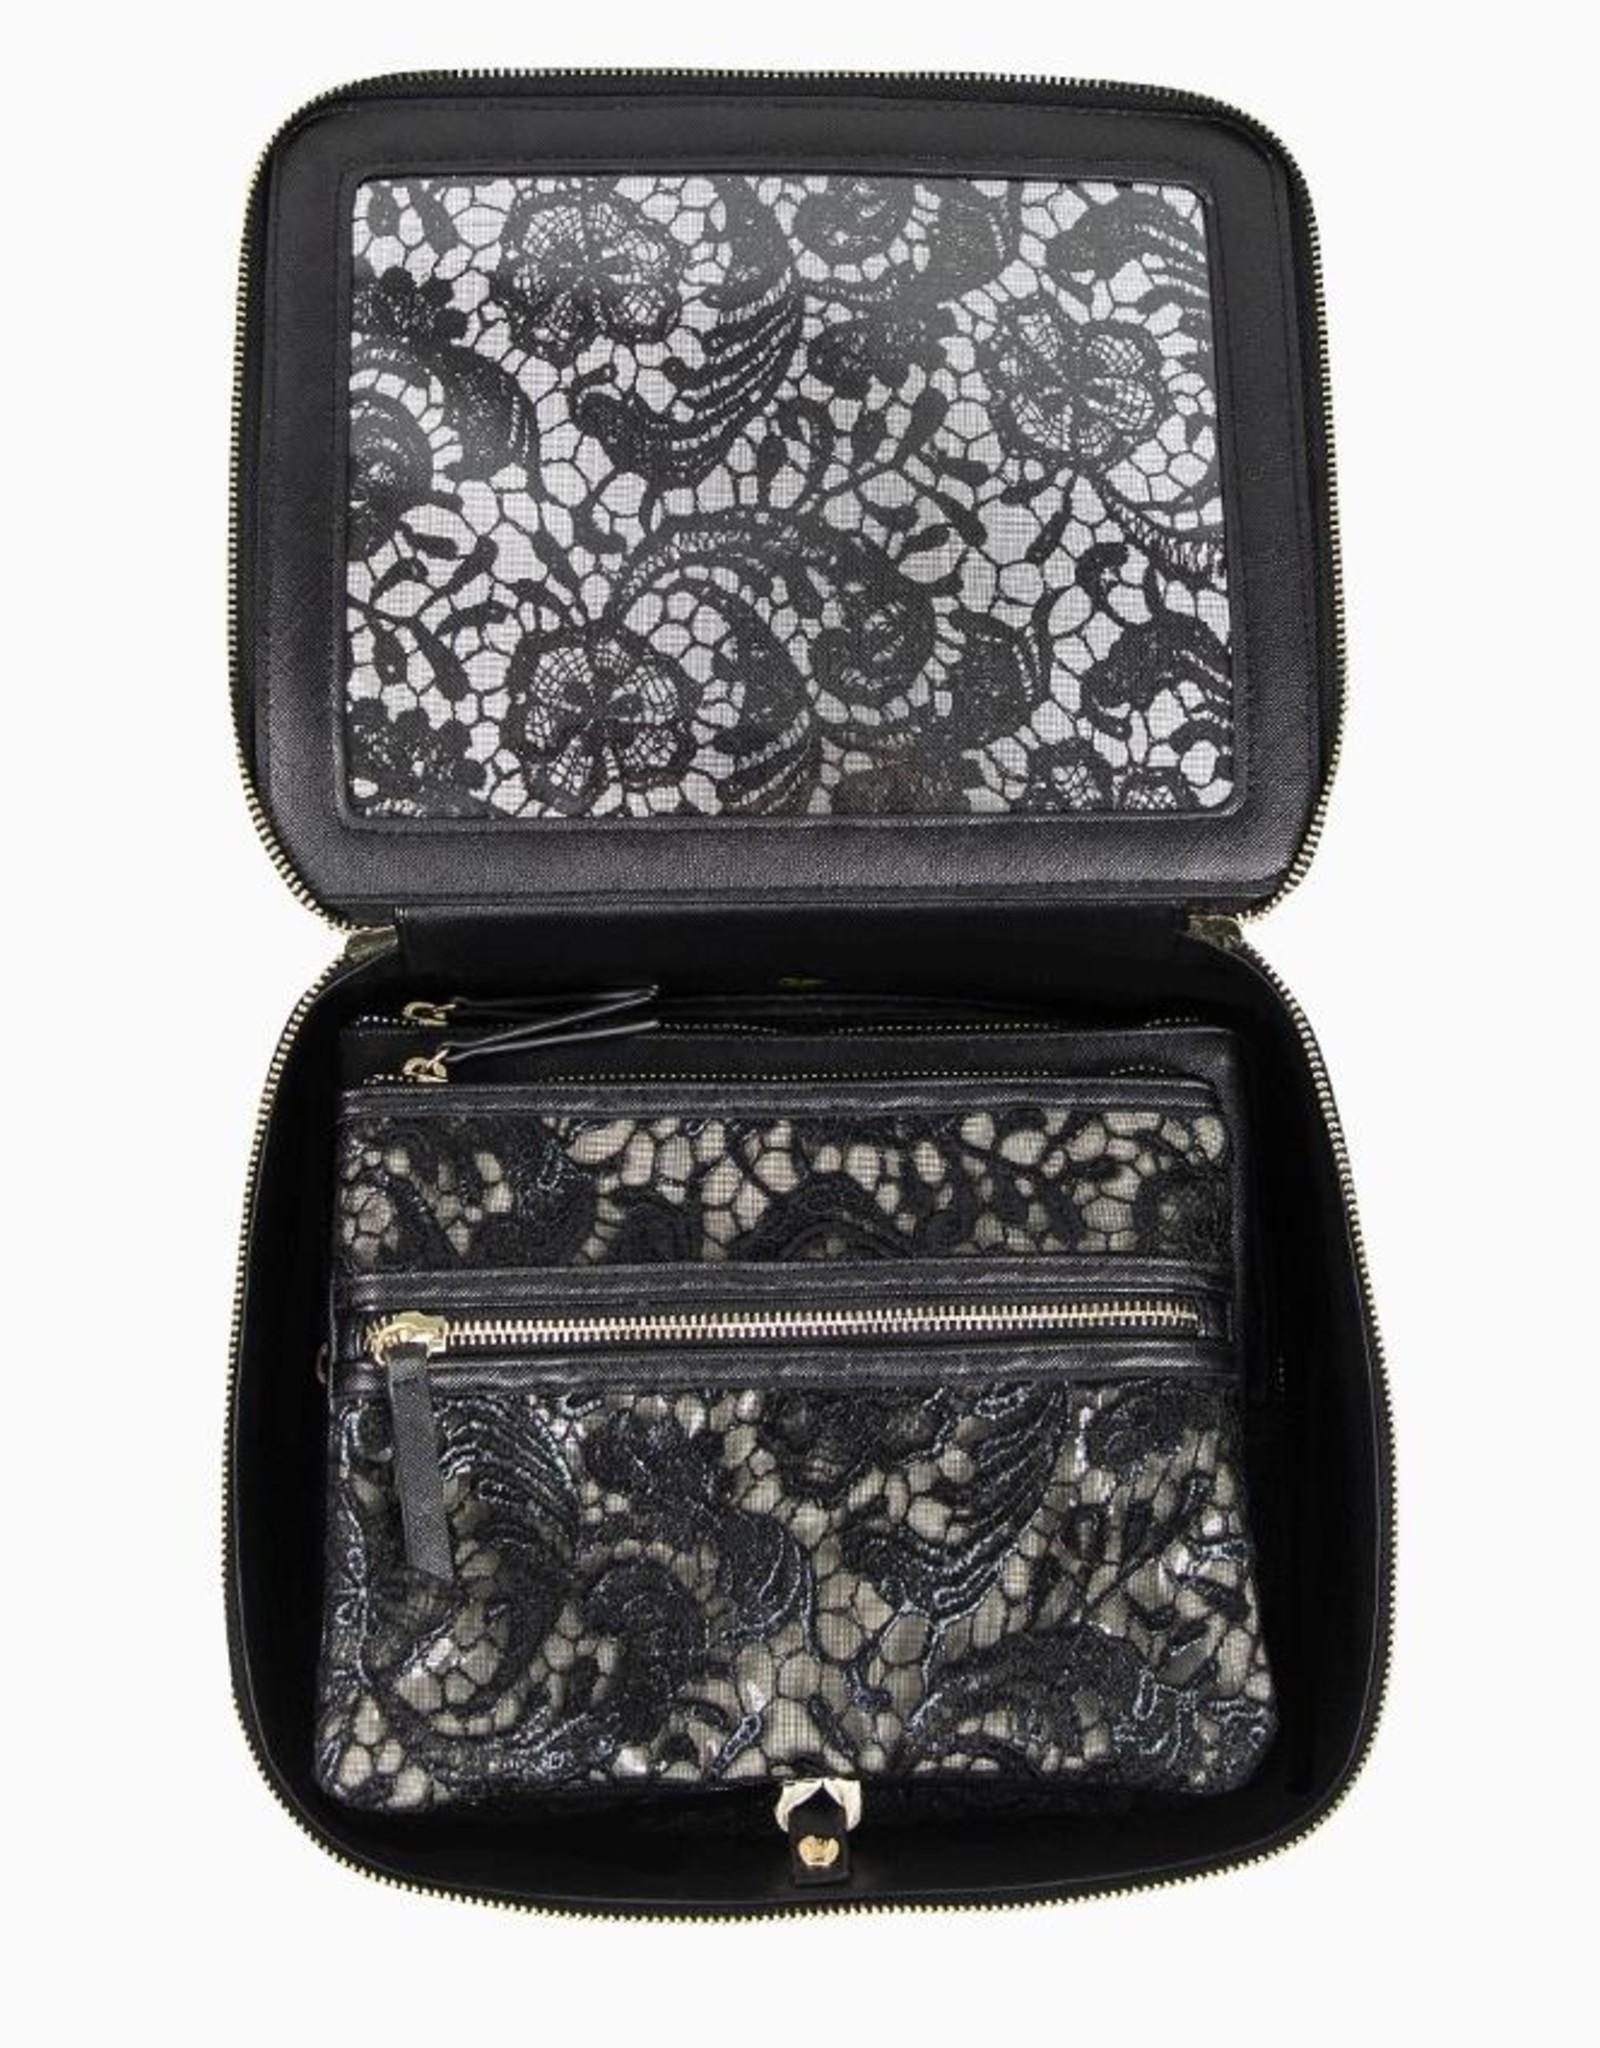 purseN Ava Travel Case - Black Lace